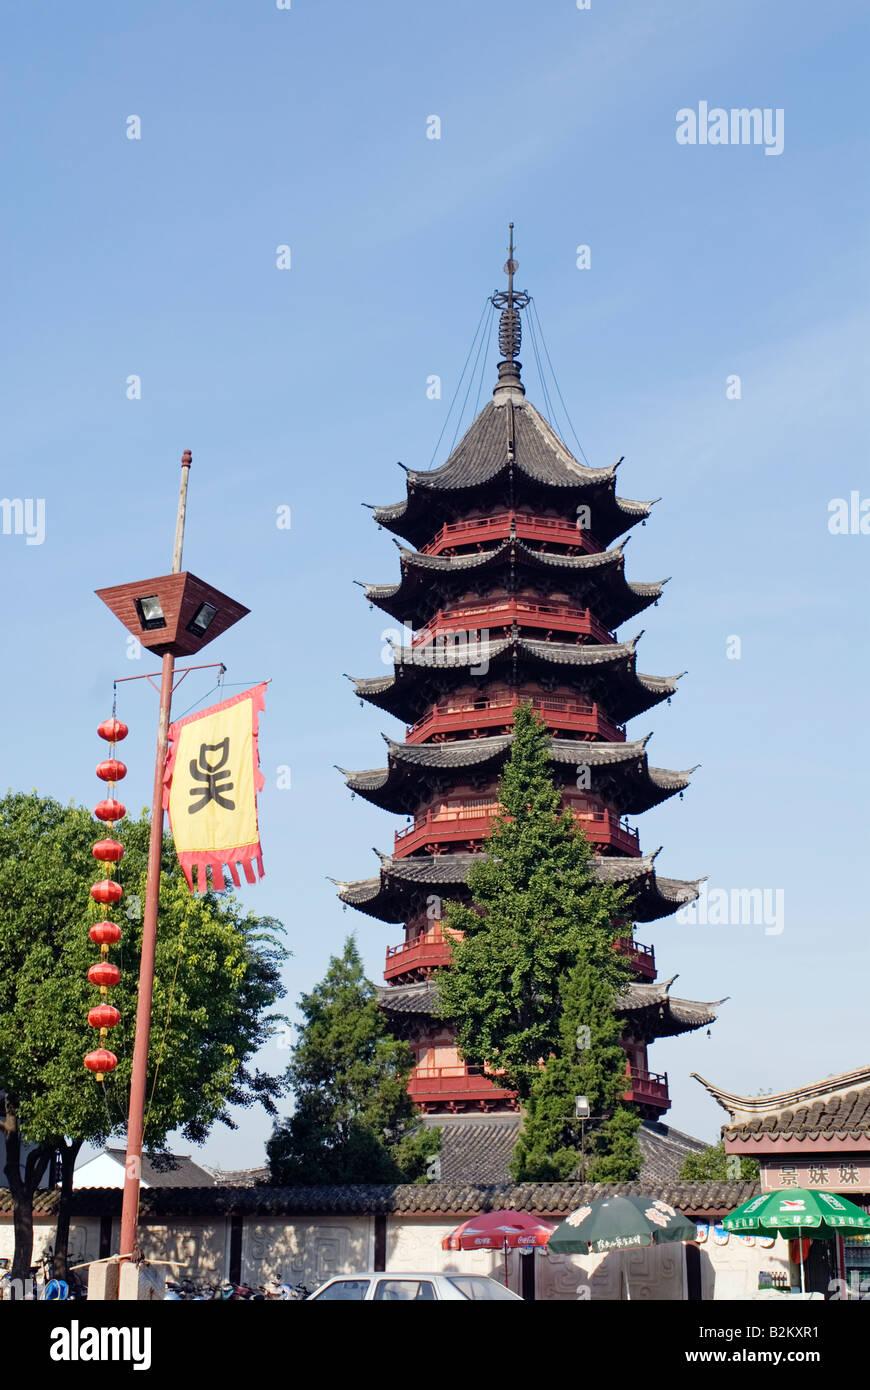 China, Suzhou, Auspicious Light Pagoda, Ruiguang Pagoda, Panmen - Stock Image